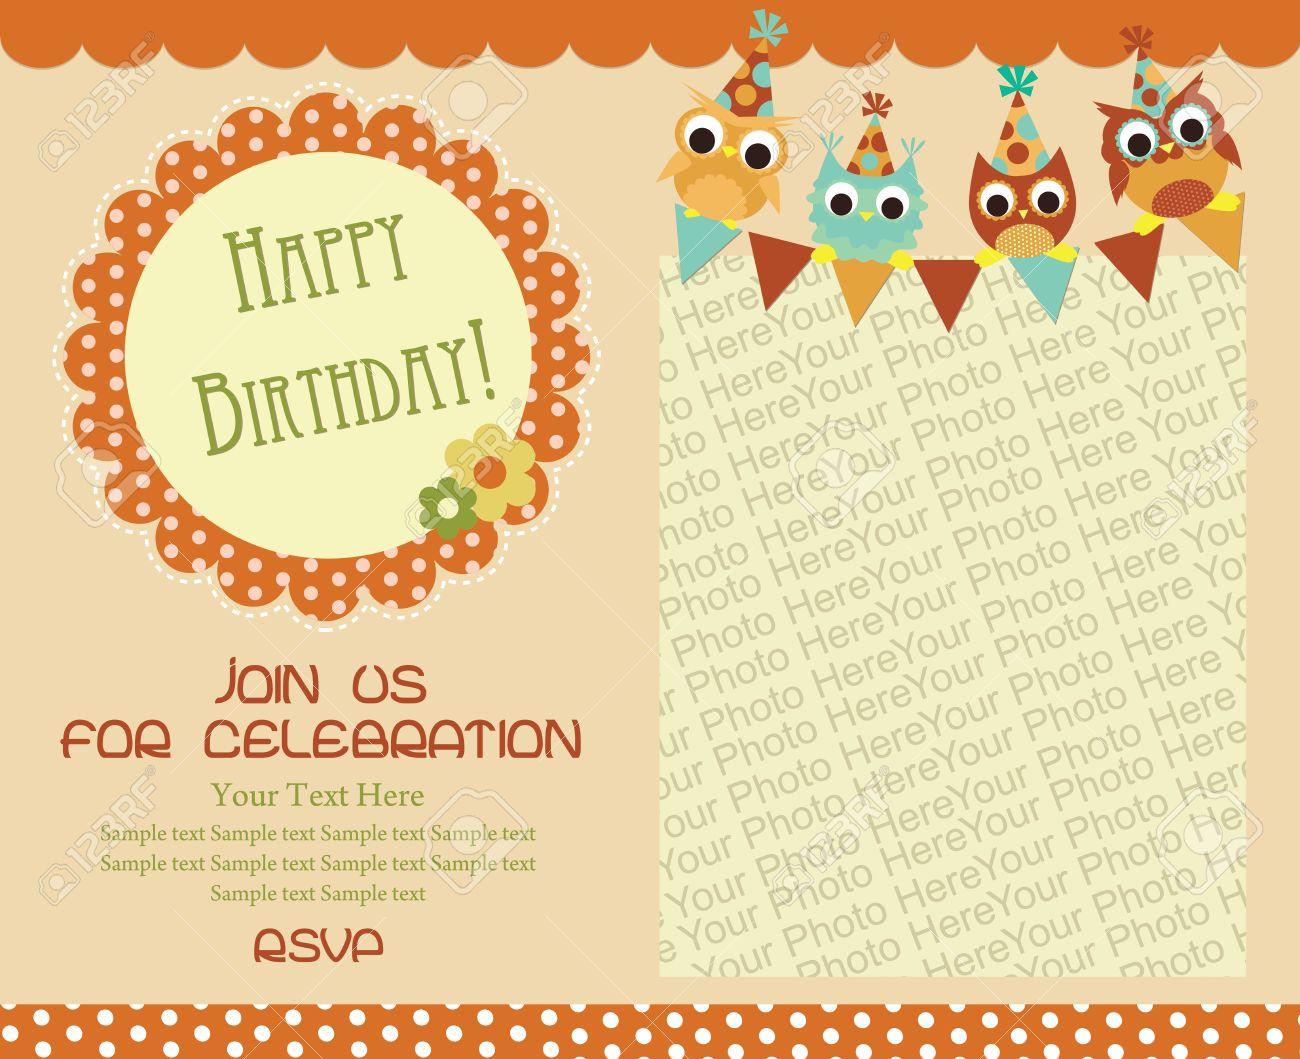 Happy Birthday Invitation Card Design Vector Illustration Royalty